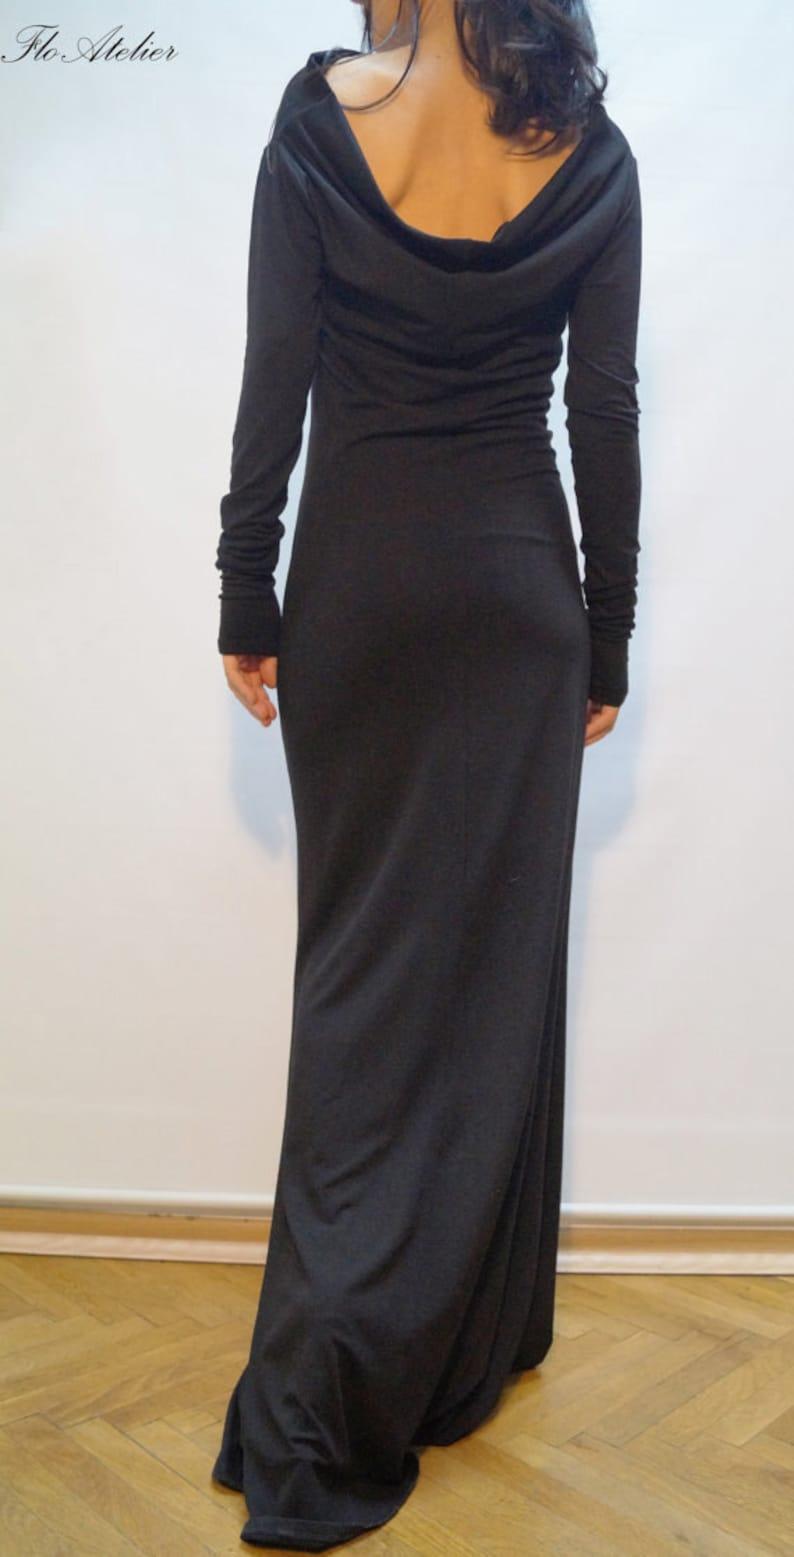 314c0cb62e7527 Lange Ärmel Maxi Kleid/Casual Abend elegante Kleid / Sexy | Etsy